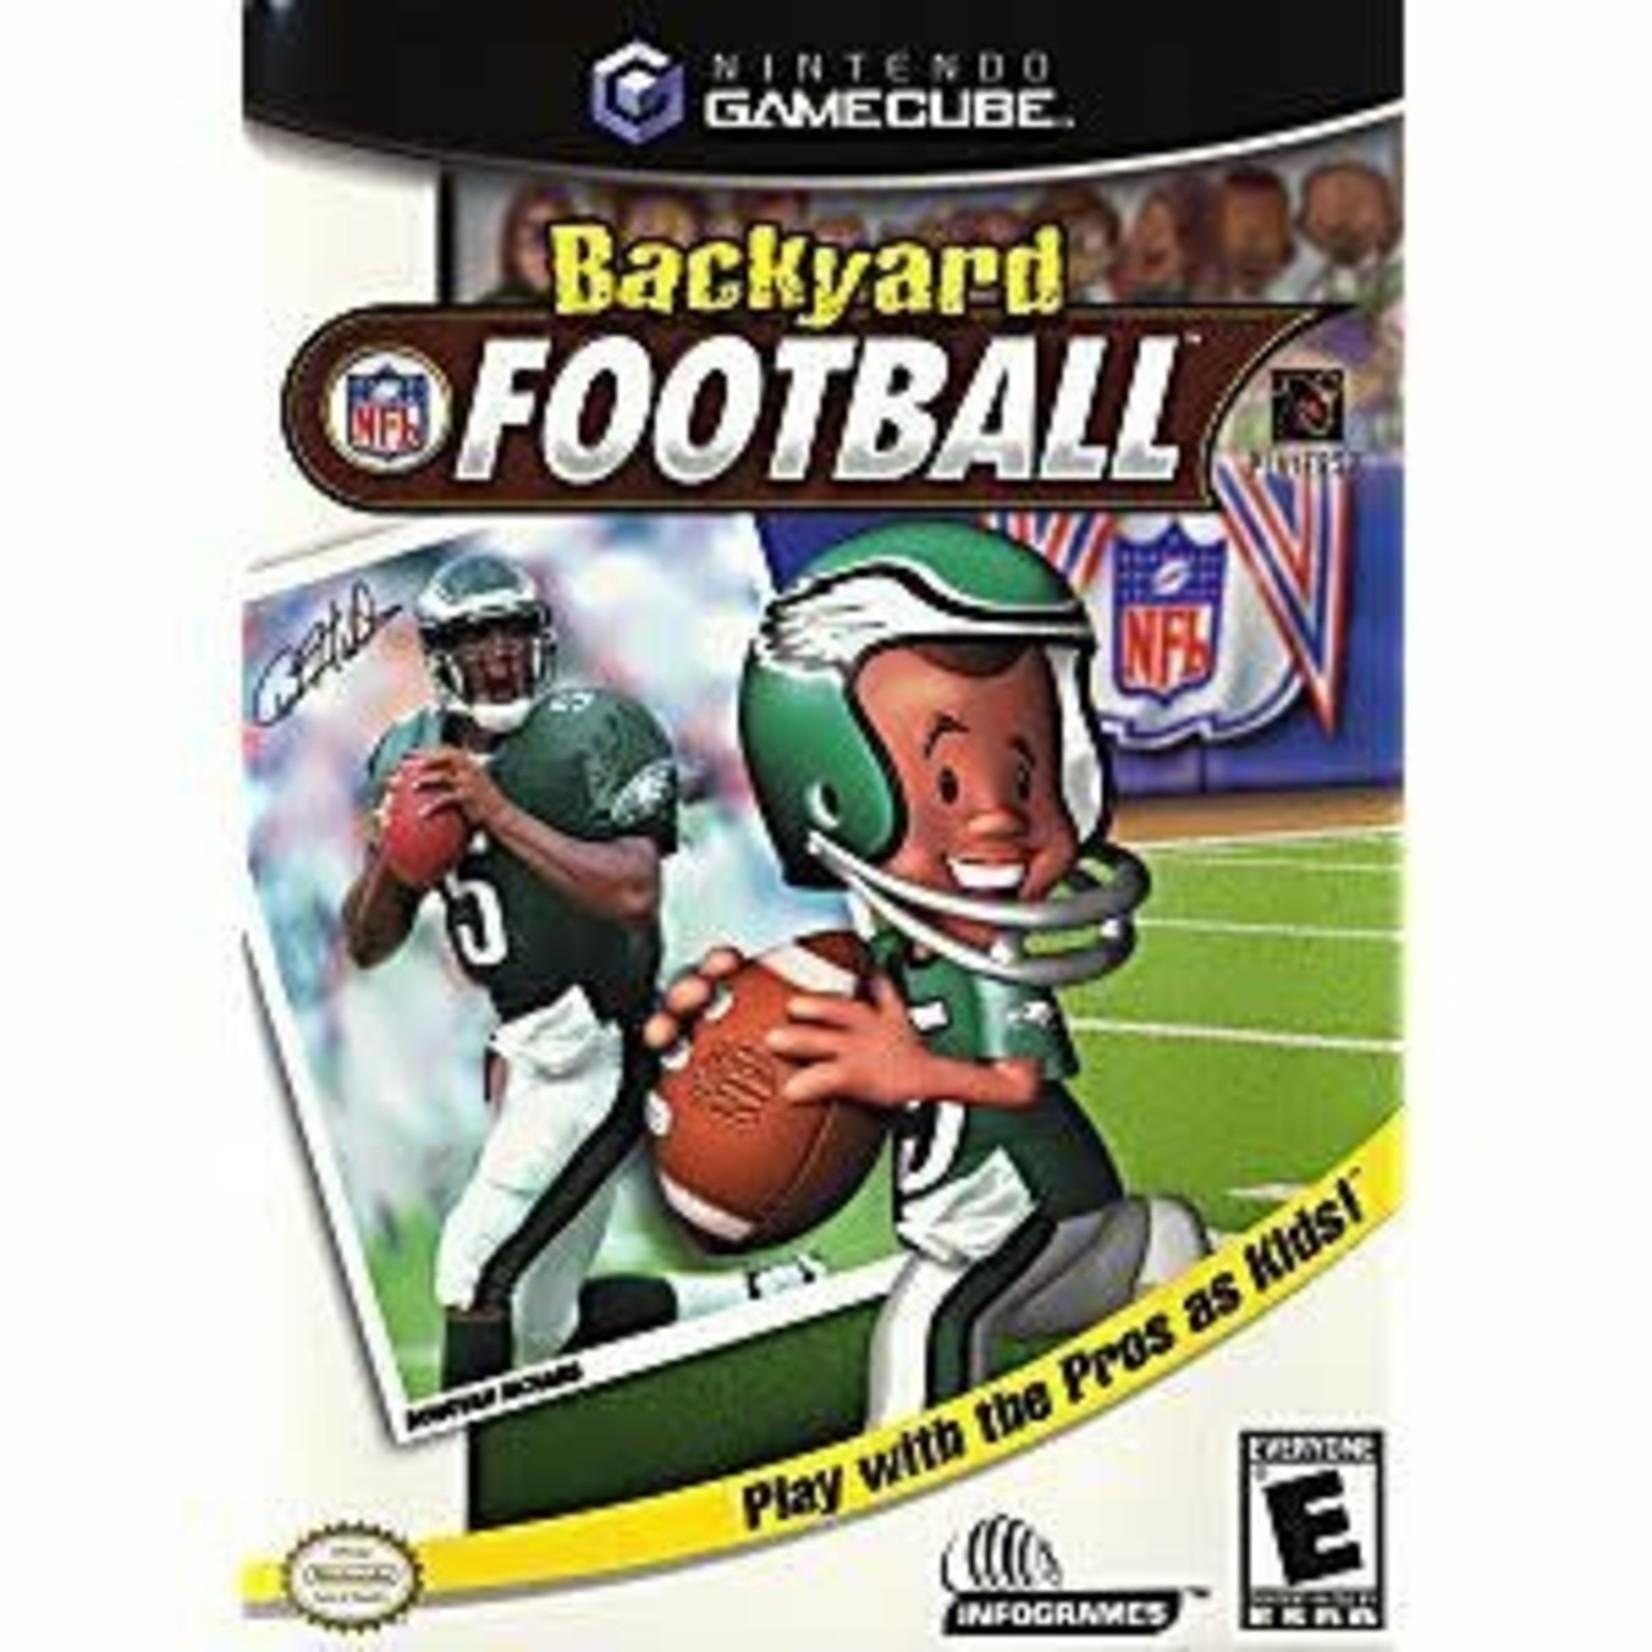 GCu-Backyard Football